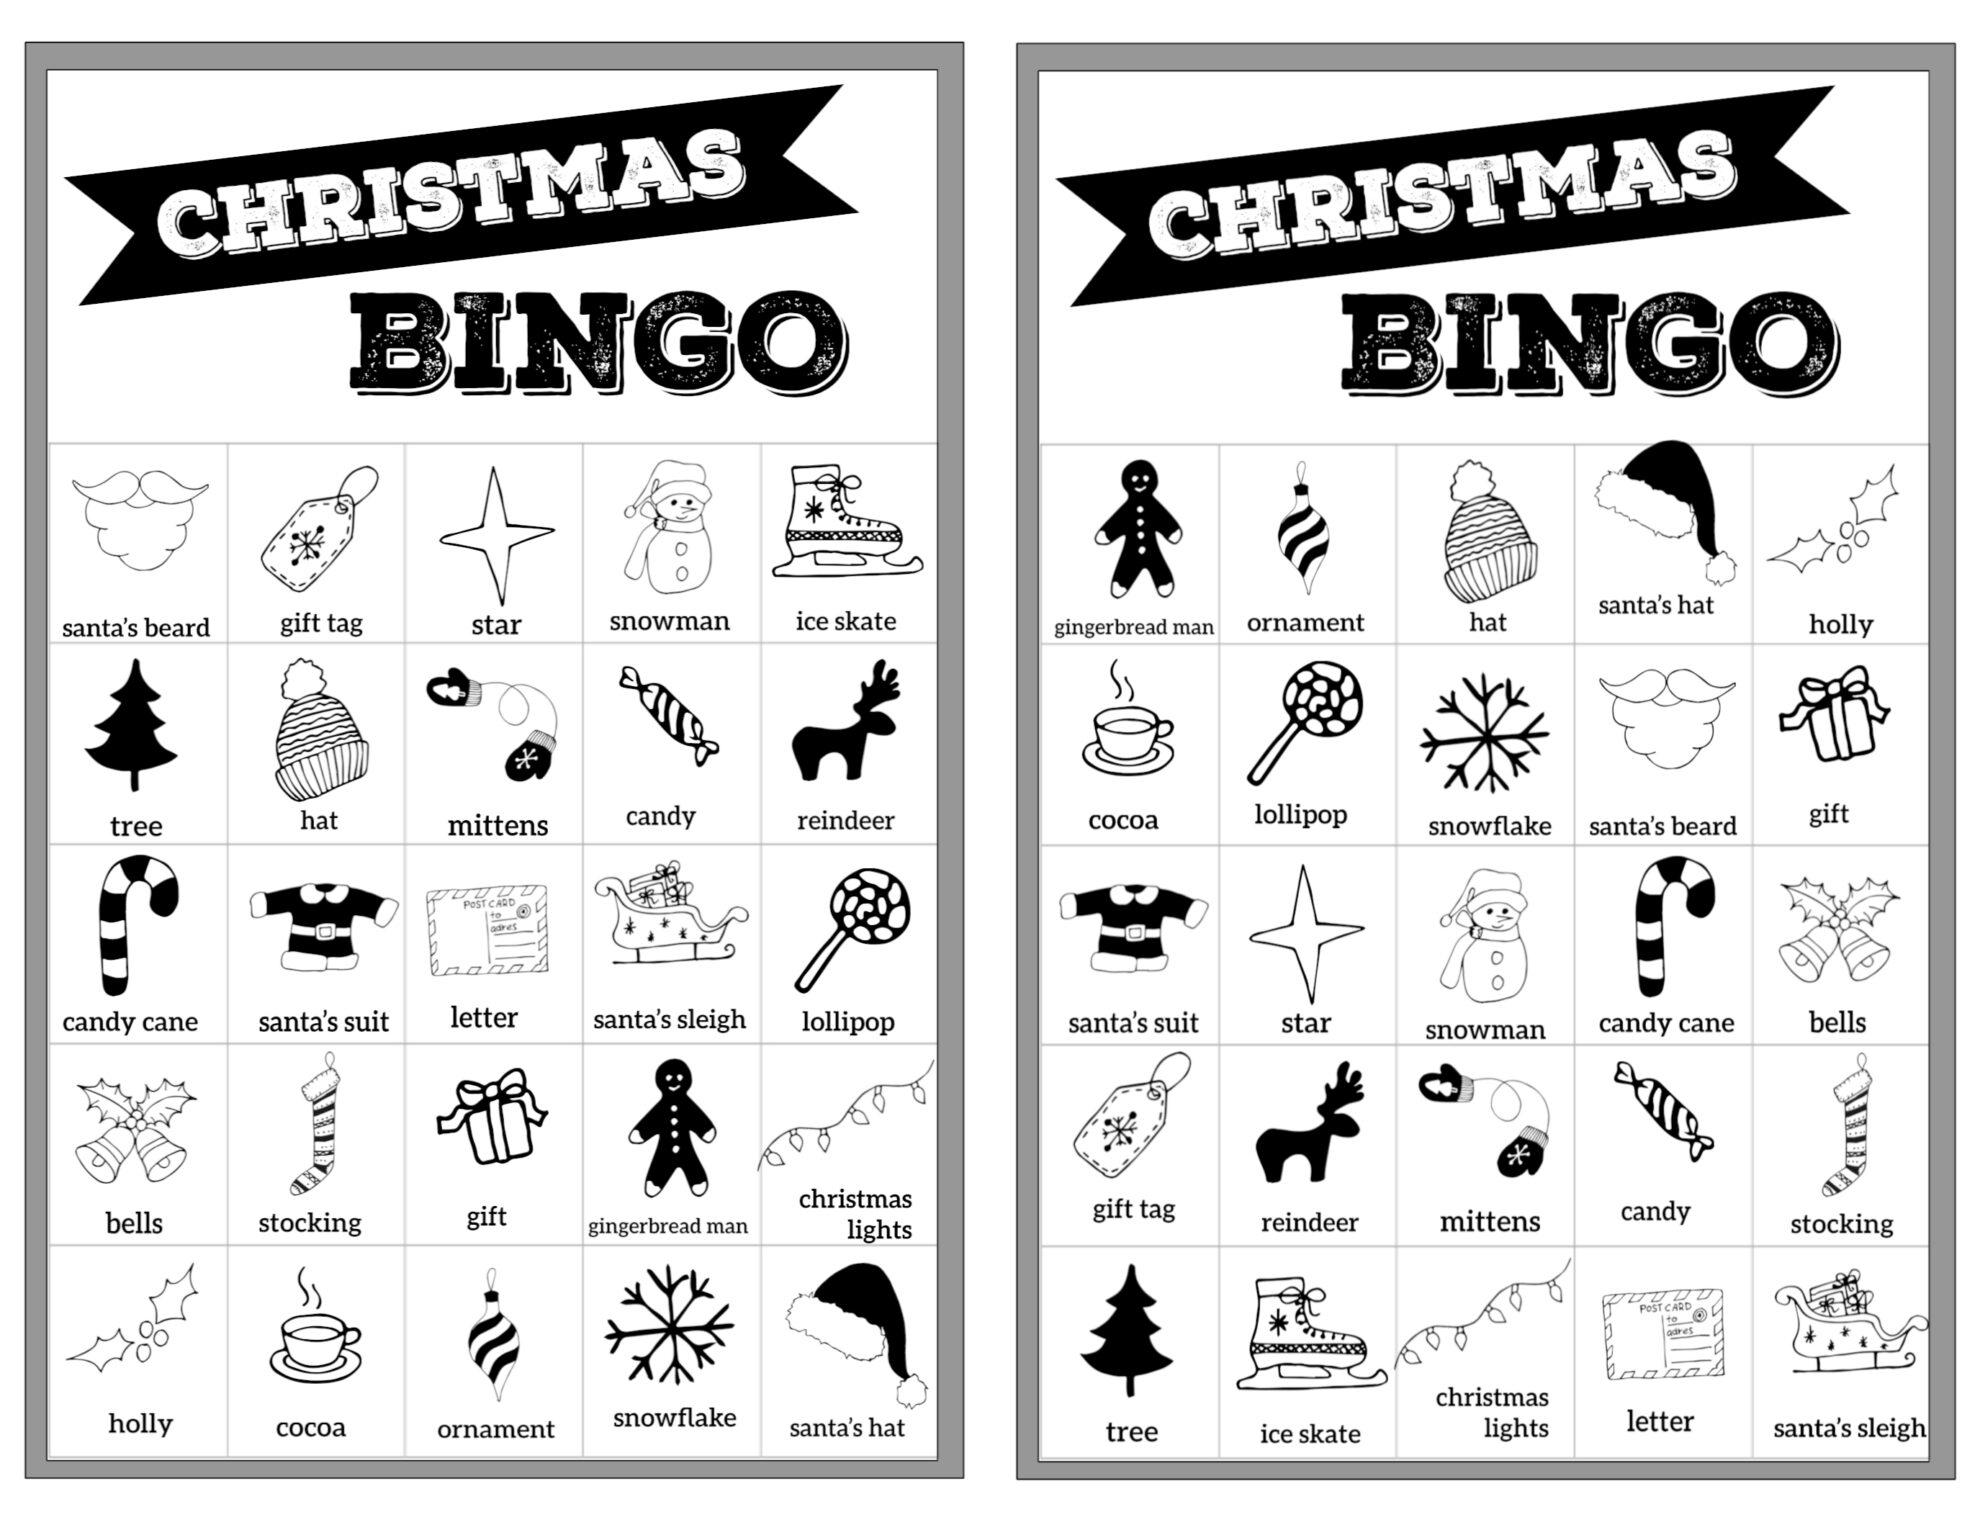 Free Christmas Bingo Printable Cards - Paper Trail Design